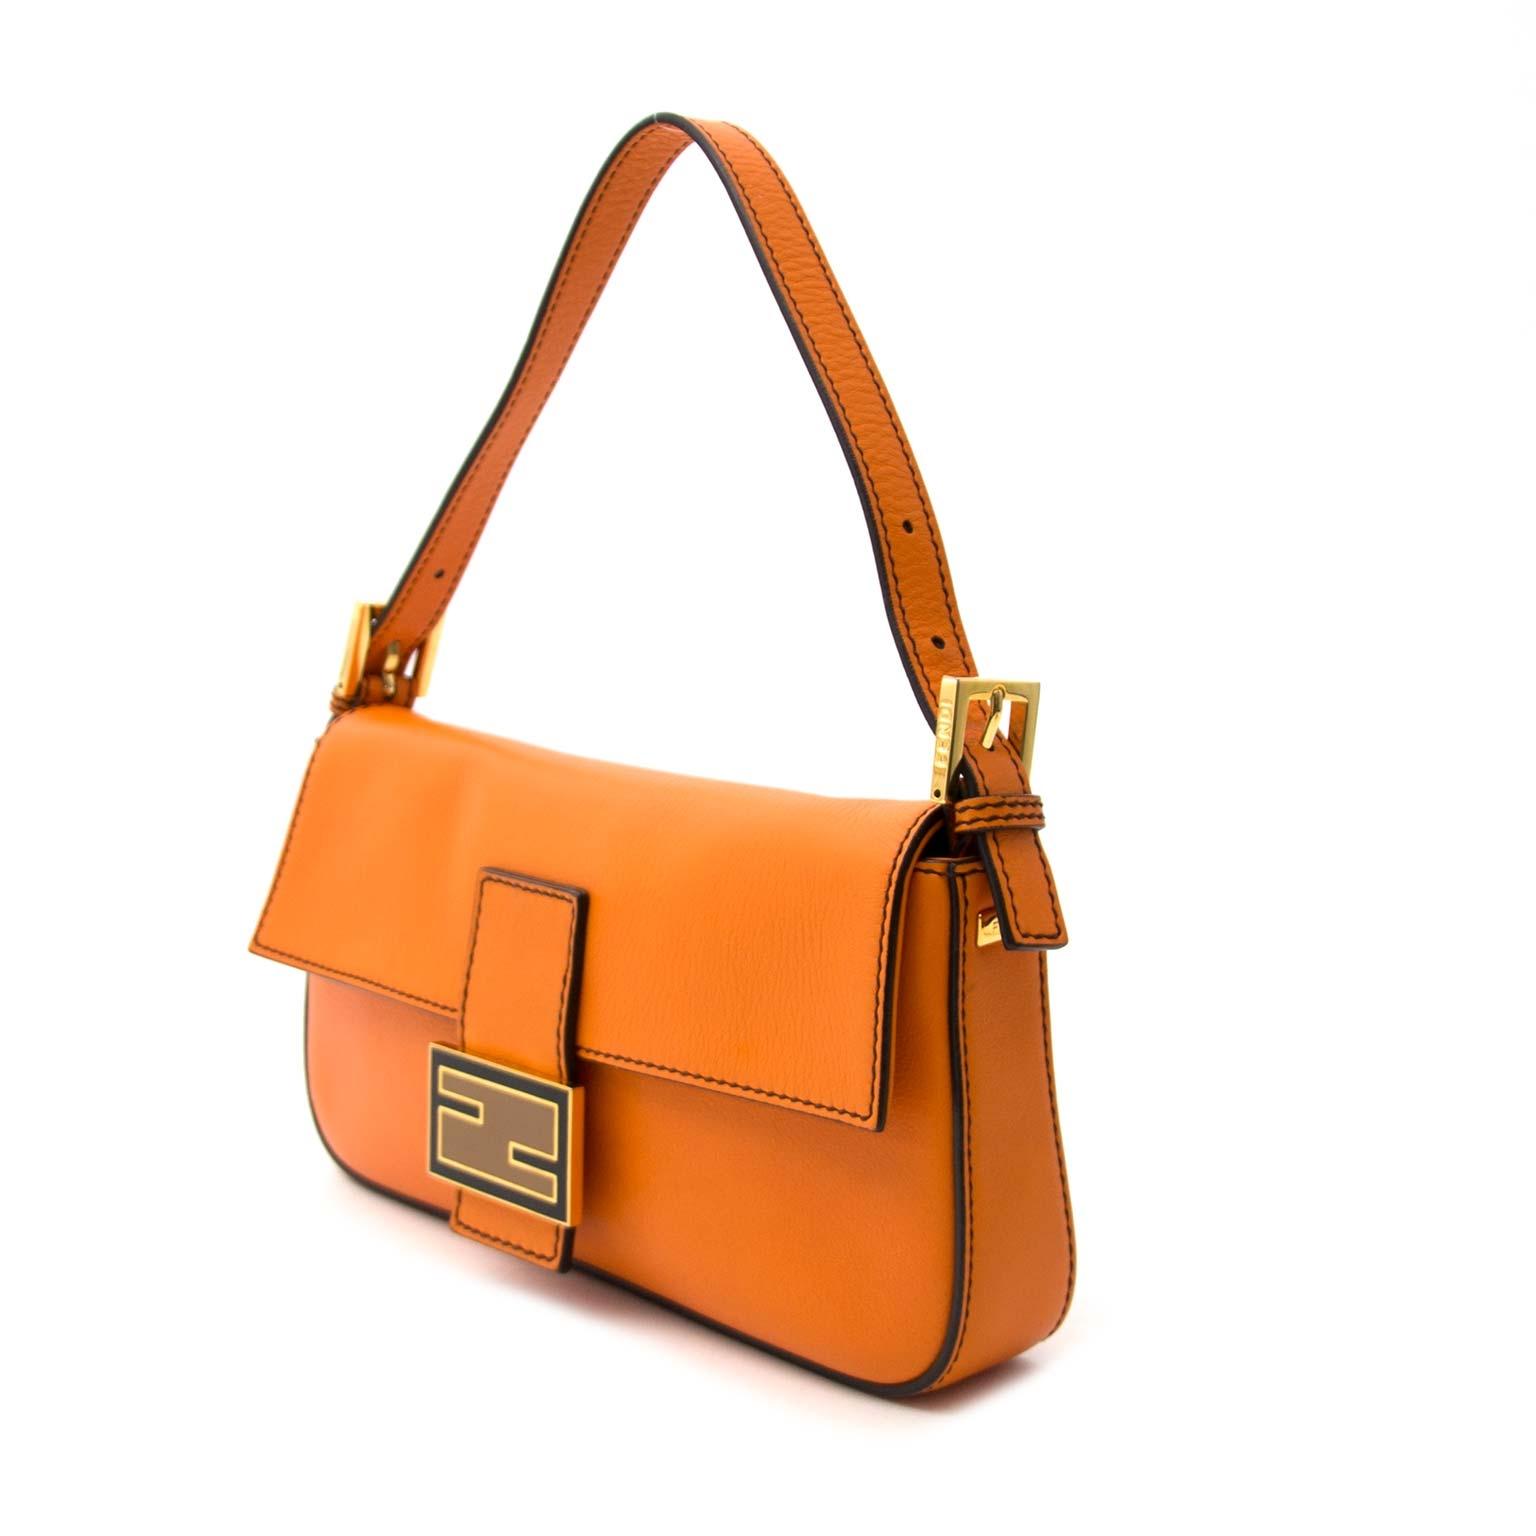 fc9d35d34ff2 ... Fendi Orange Baguette Shoulder Bag Buy authentic designer Fendi  secondhand bags at Labellov at the best